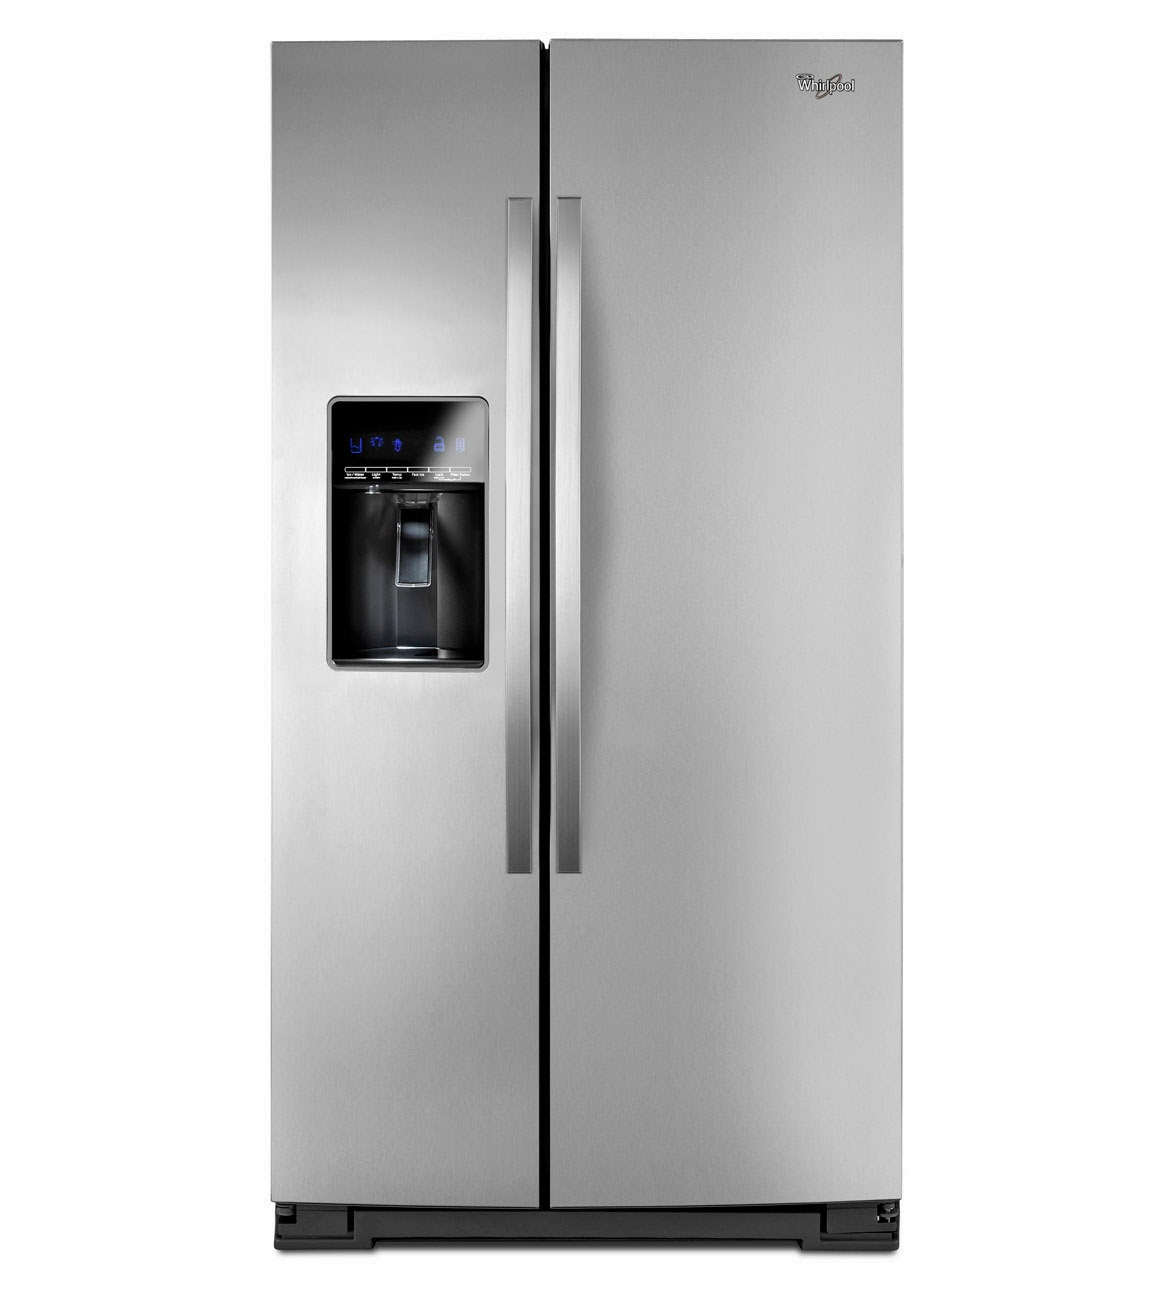 Whirlpool Refrigerator Brand Energy Star Wrs537siam